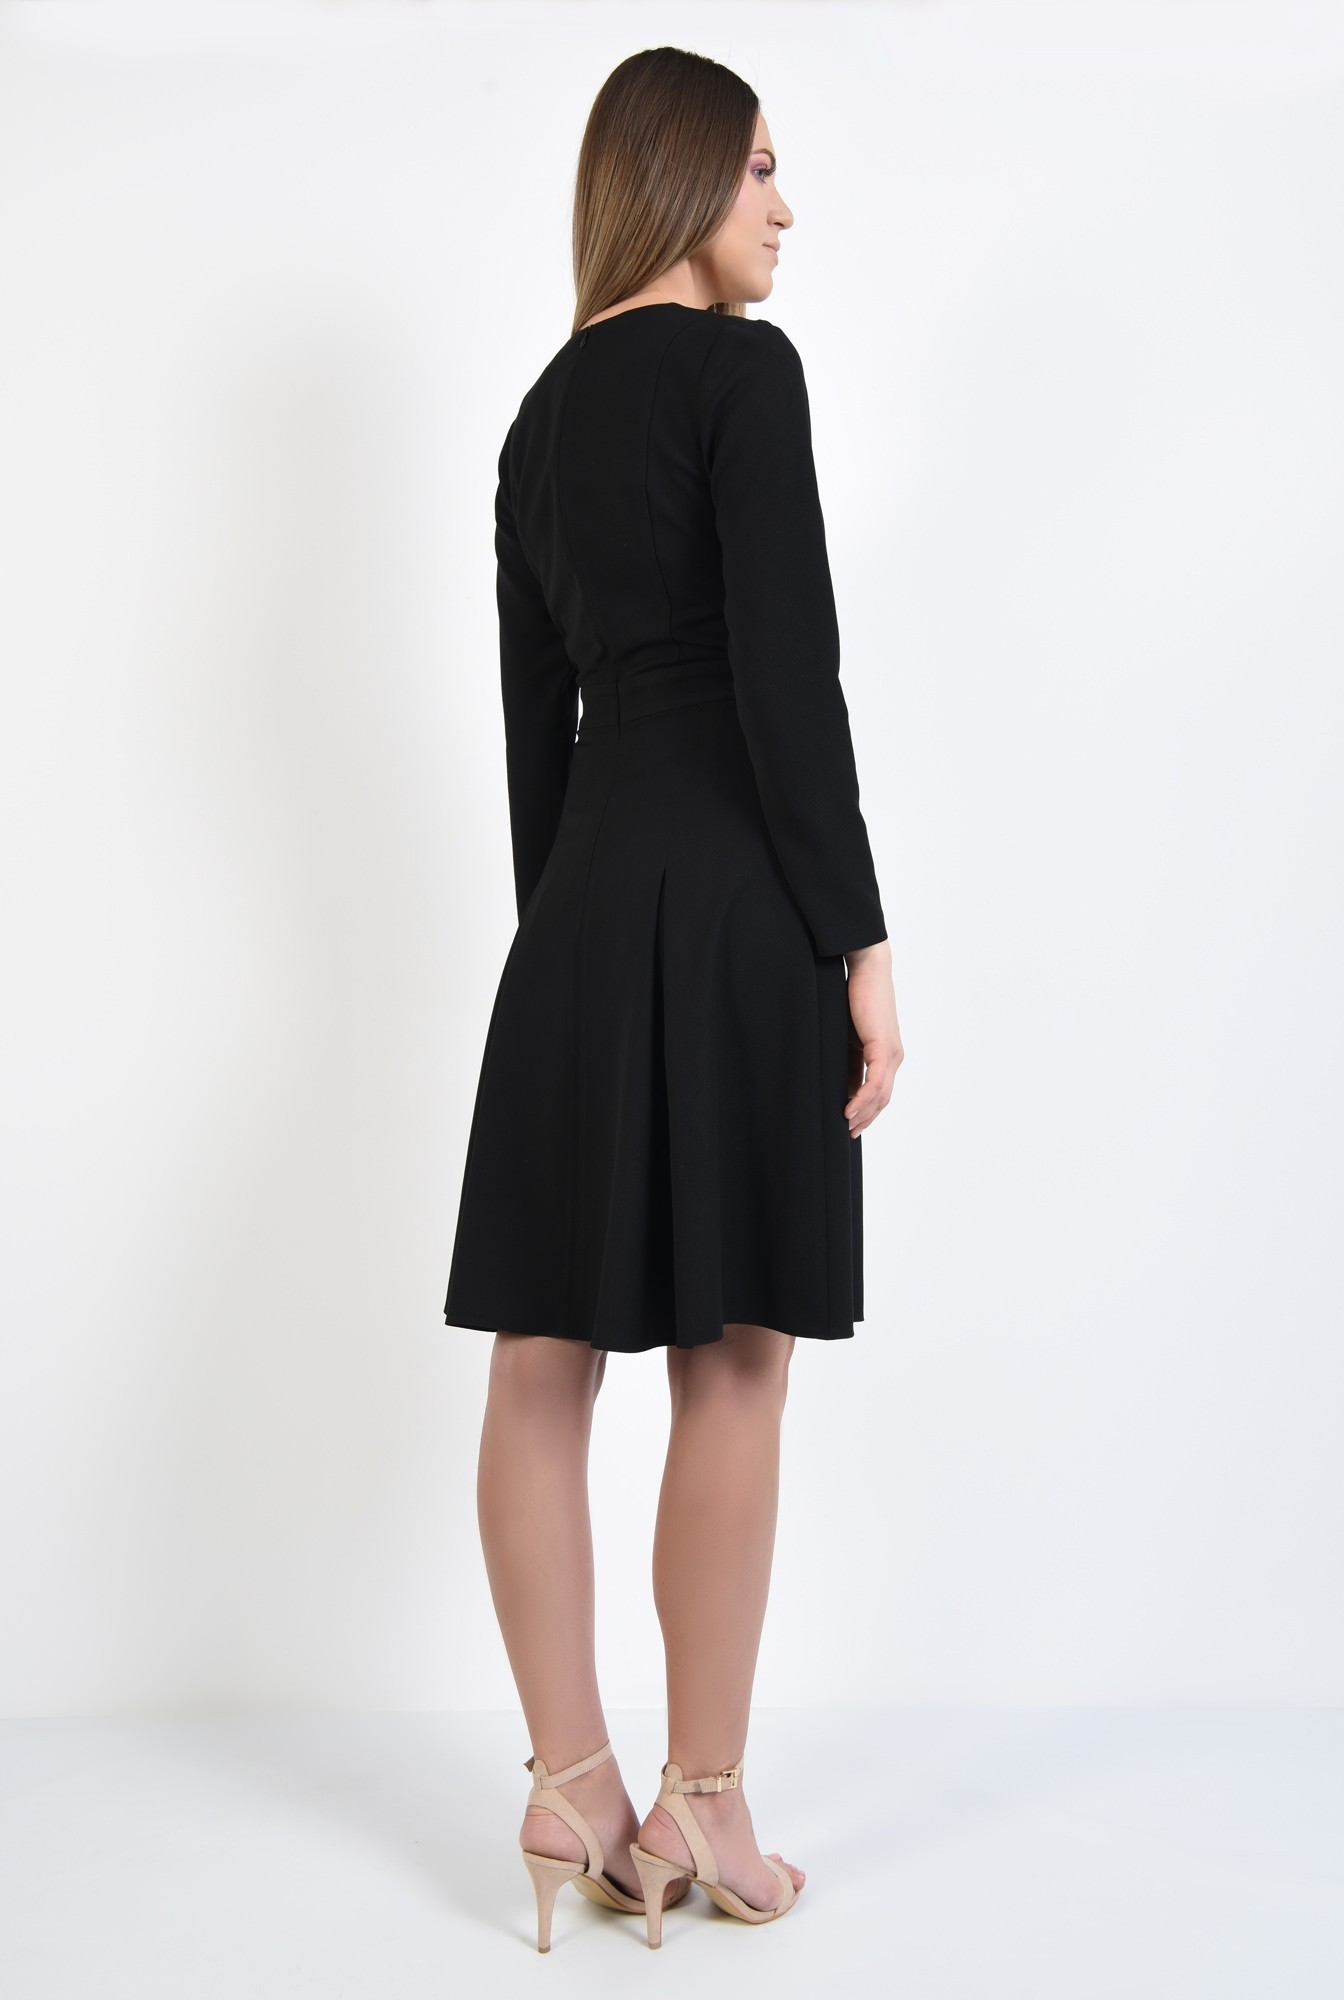 1 - rochie neagra, midi, din crep, maneci lungi ajustate